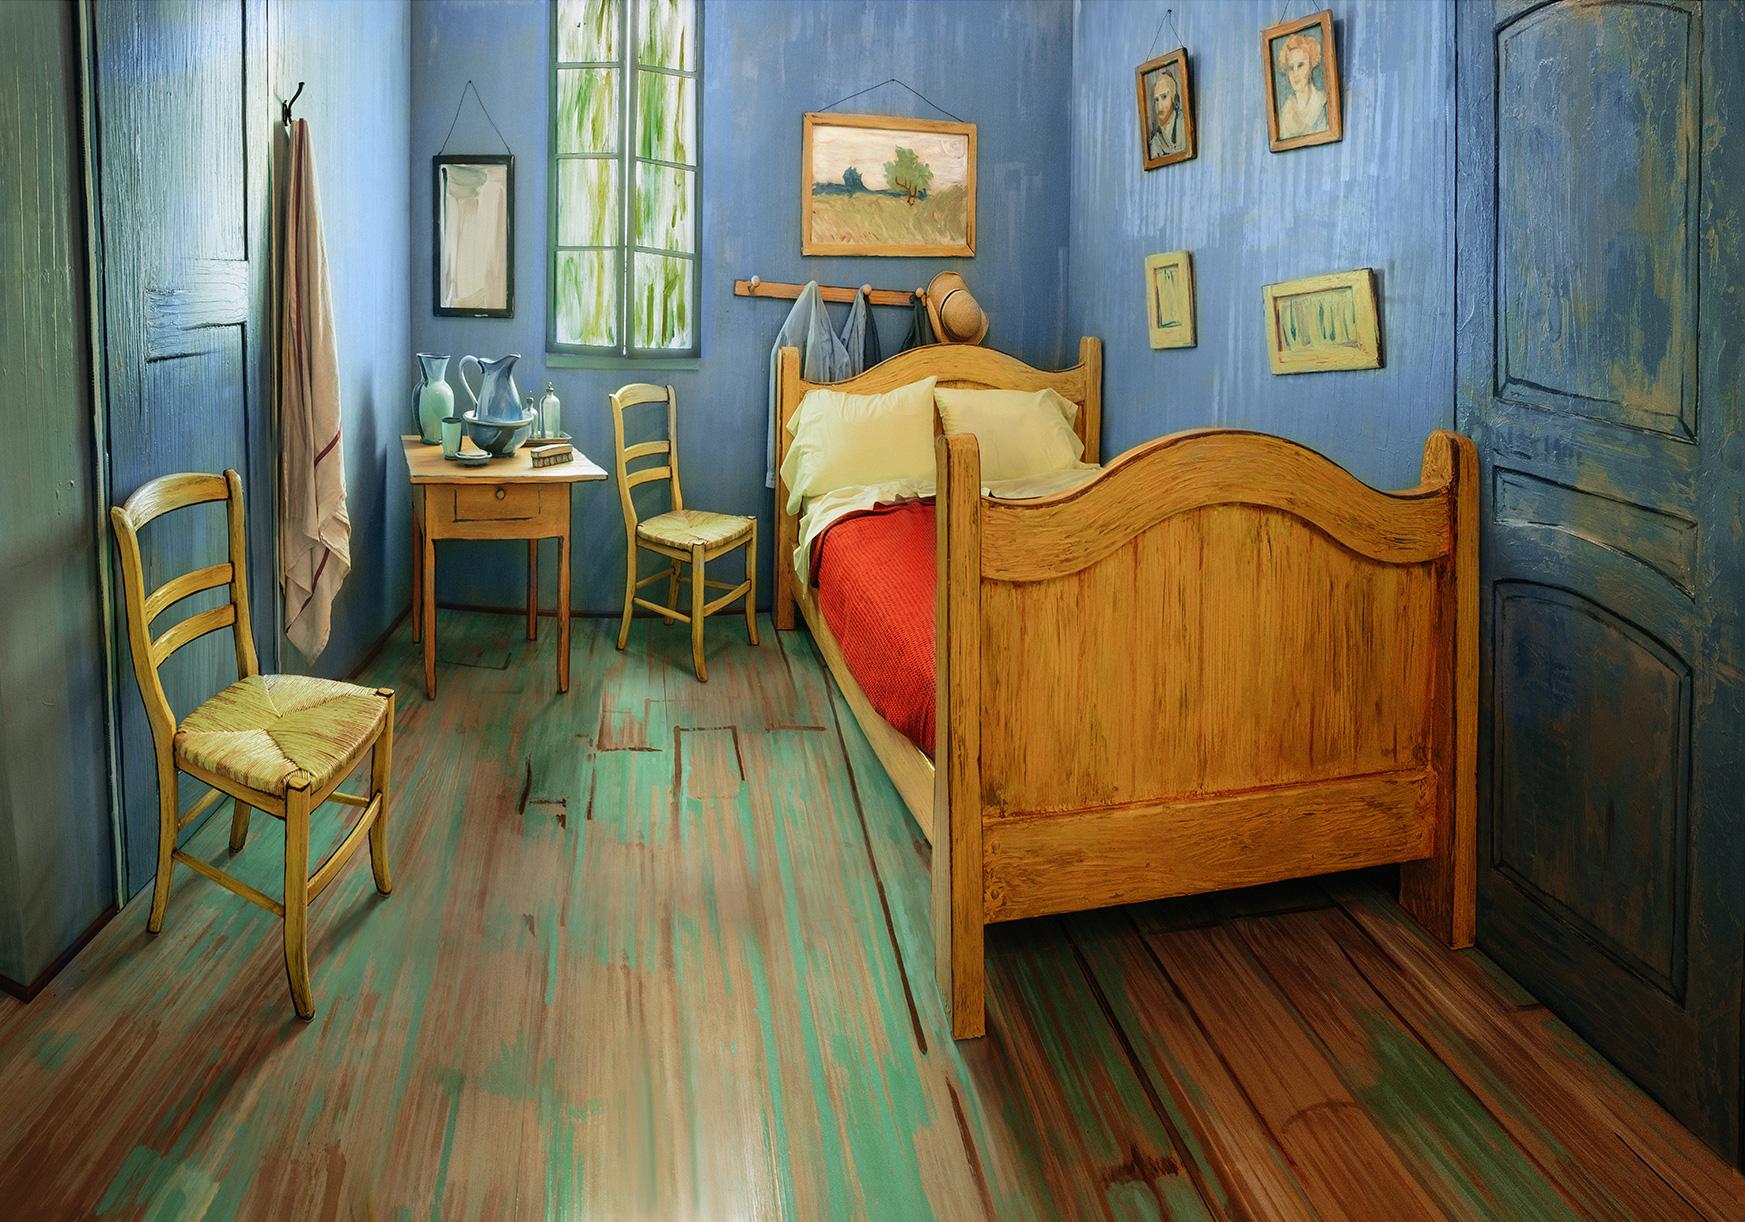 Leo Burnett Built a Livable Model of Van Gogh\'s \'Bedroom\' That You ...